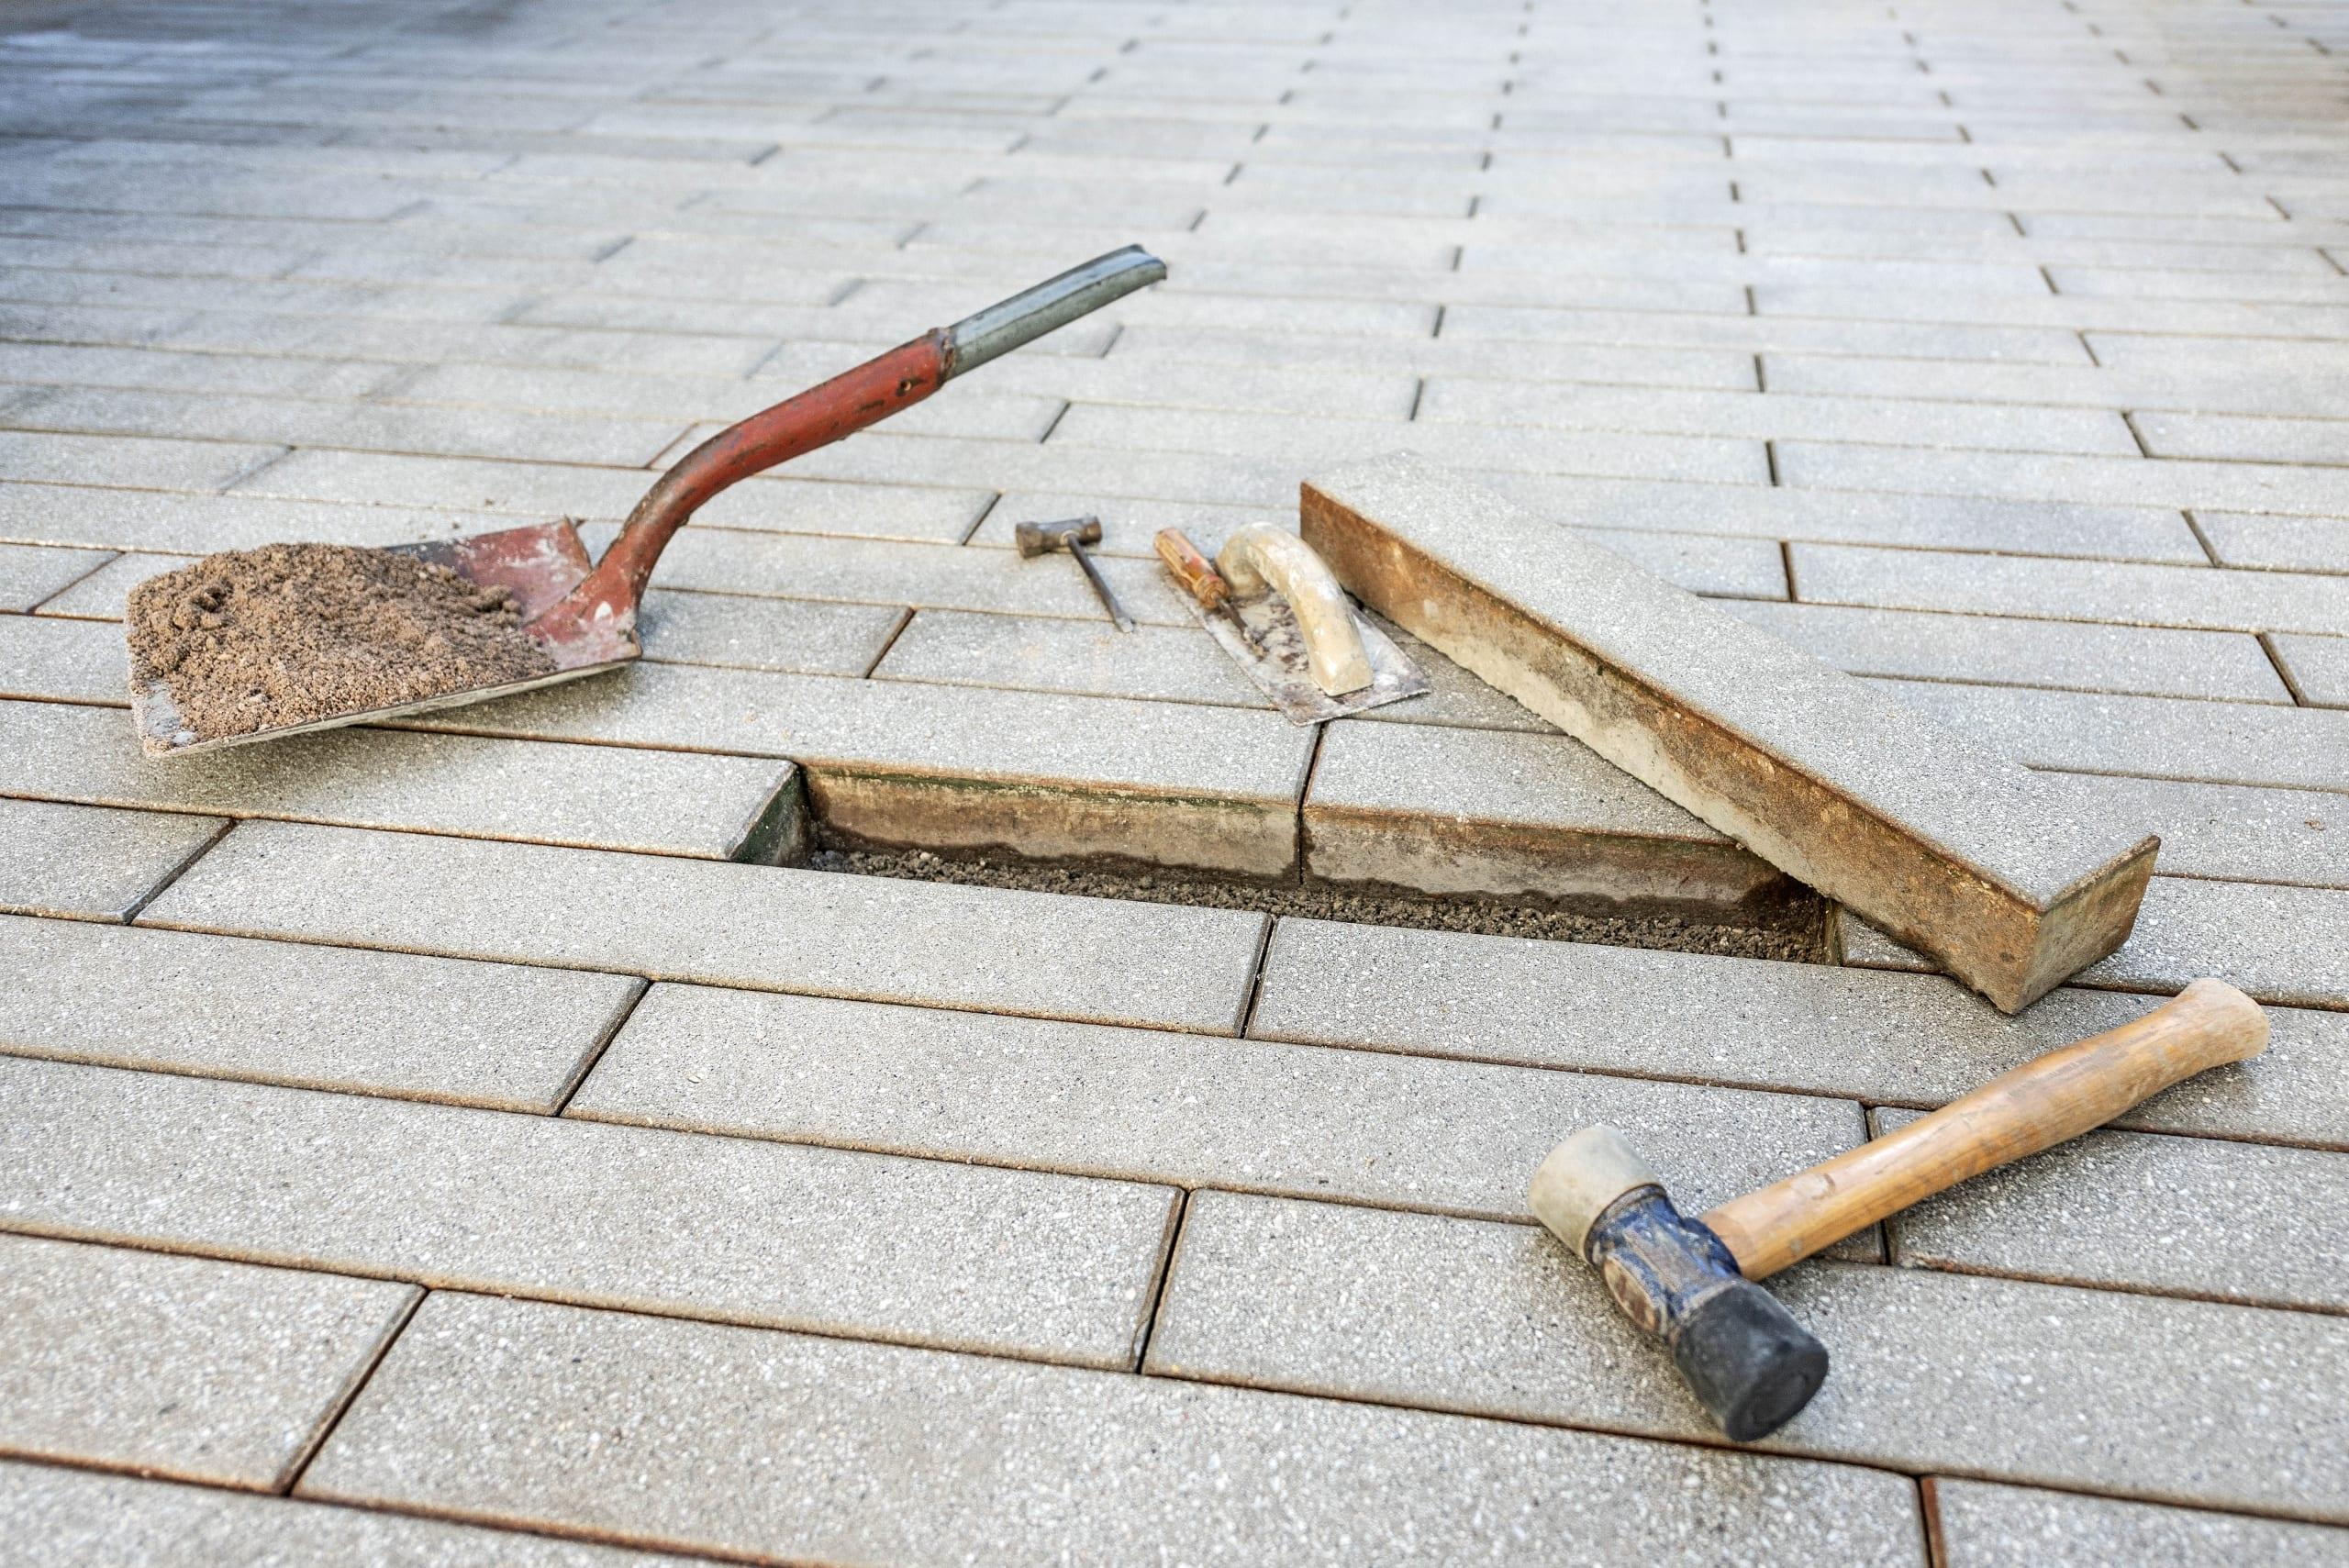 Tools Sarasota Memorial Hospital Helmuth Landscaping Pros Paving Spade Hammer